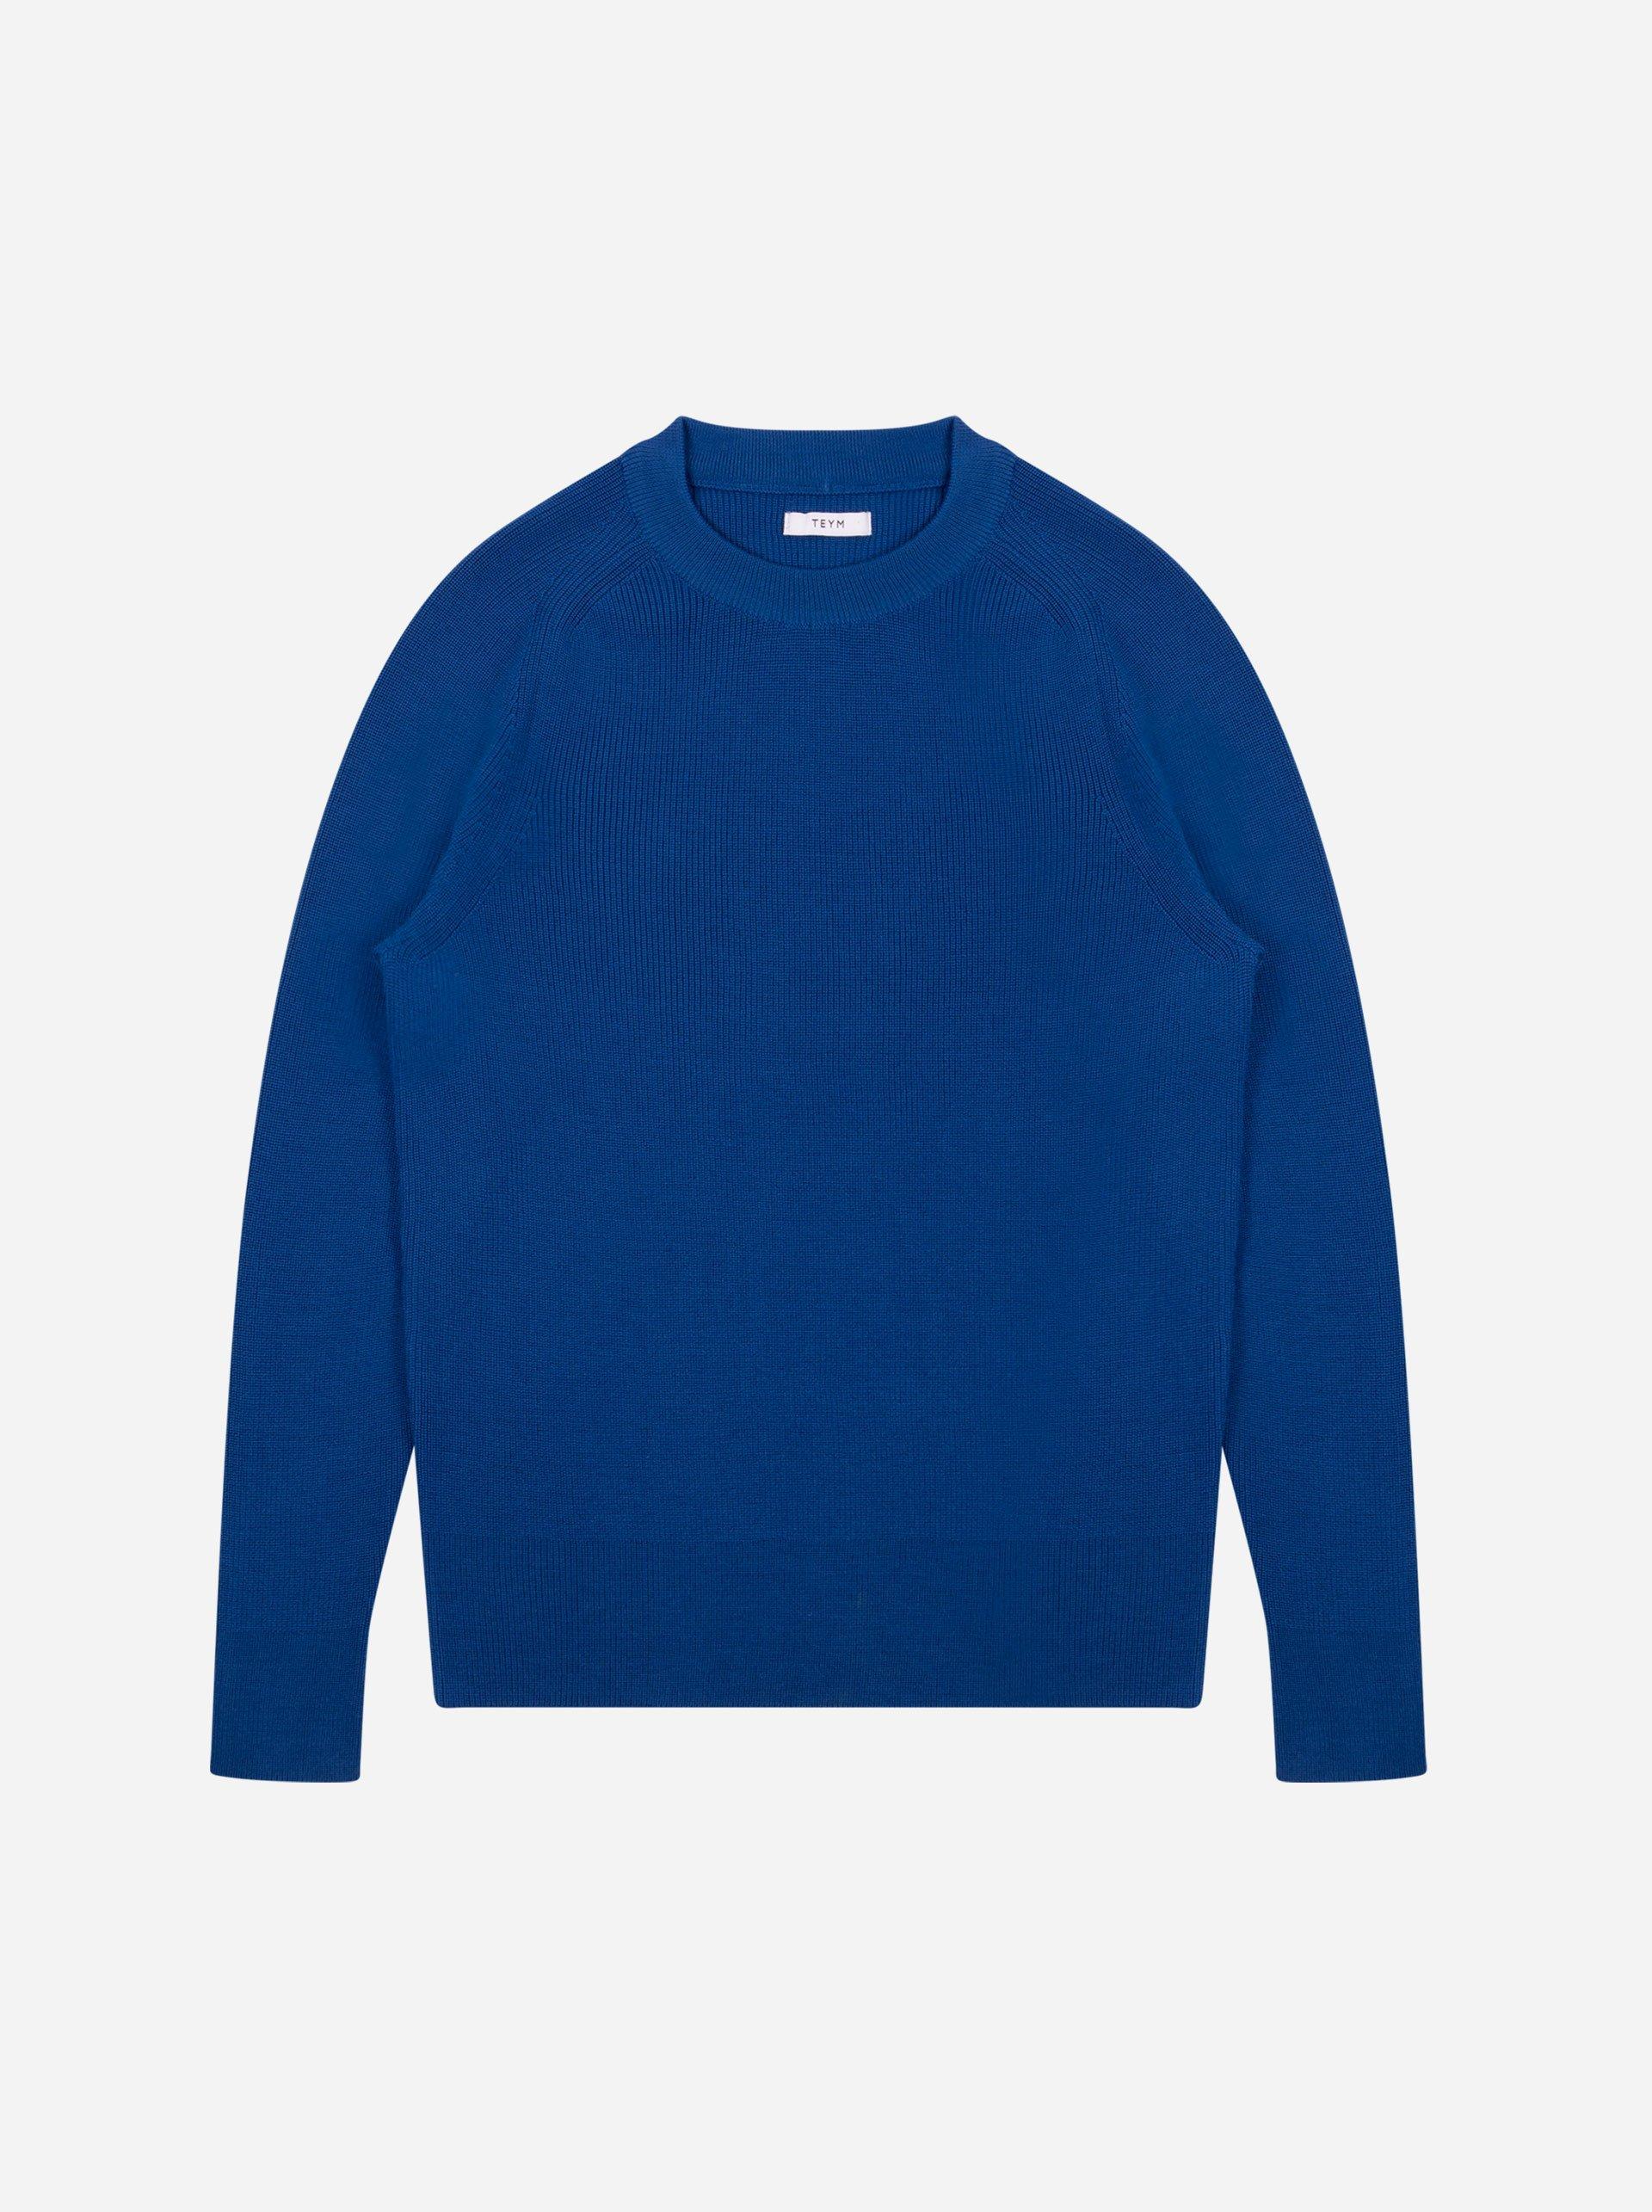 Teym - Crewneck - The Merino Sweater - Men - Cobalt blue - 4